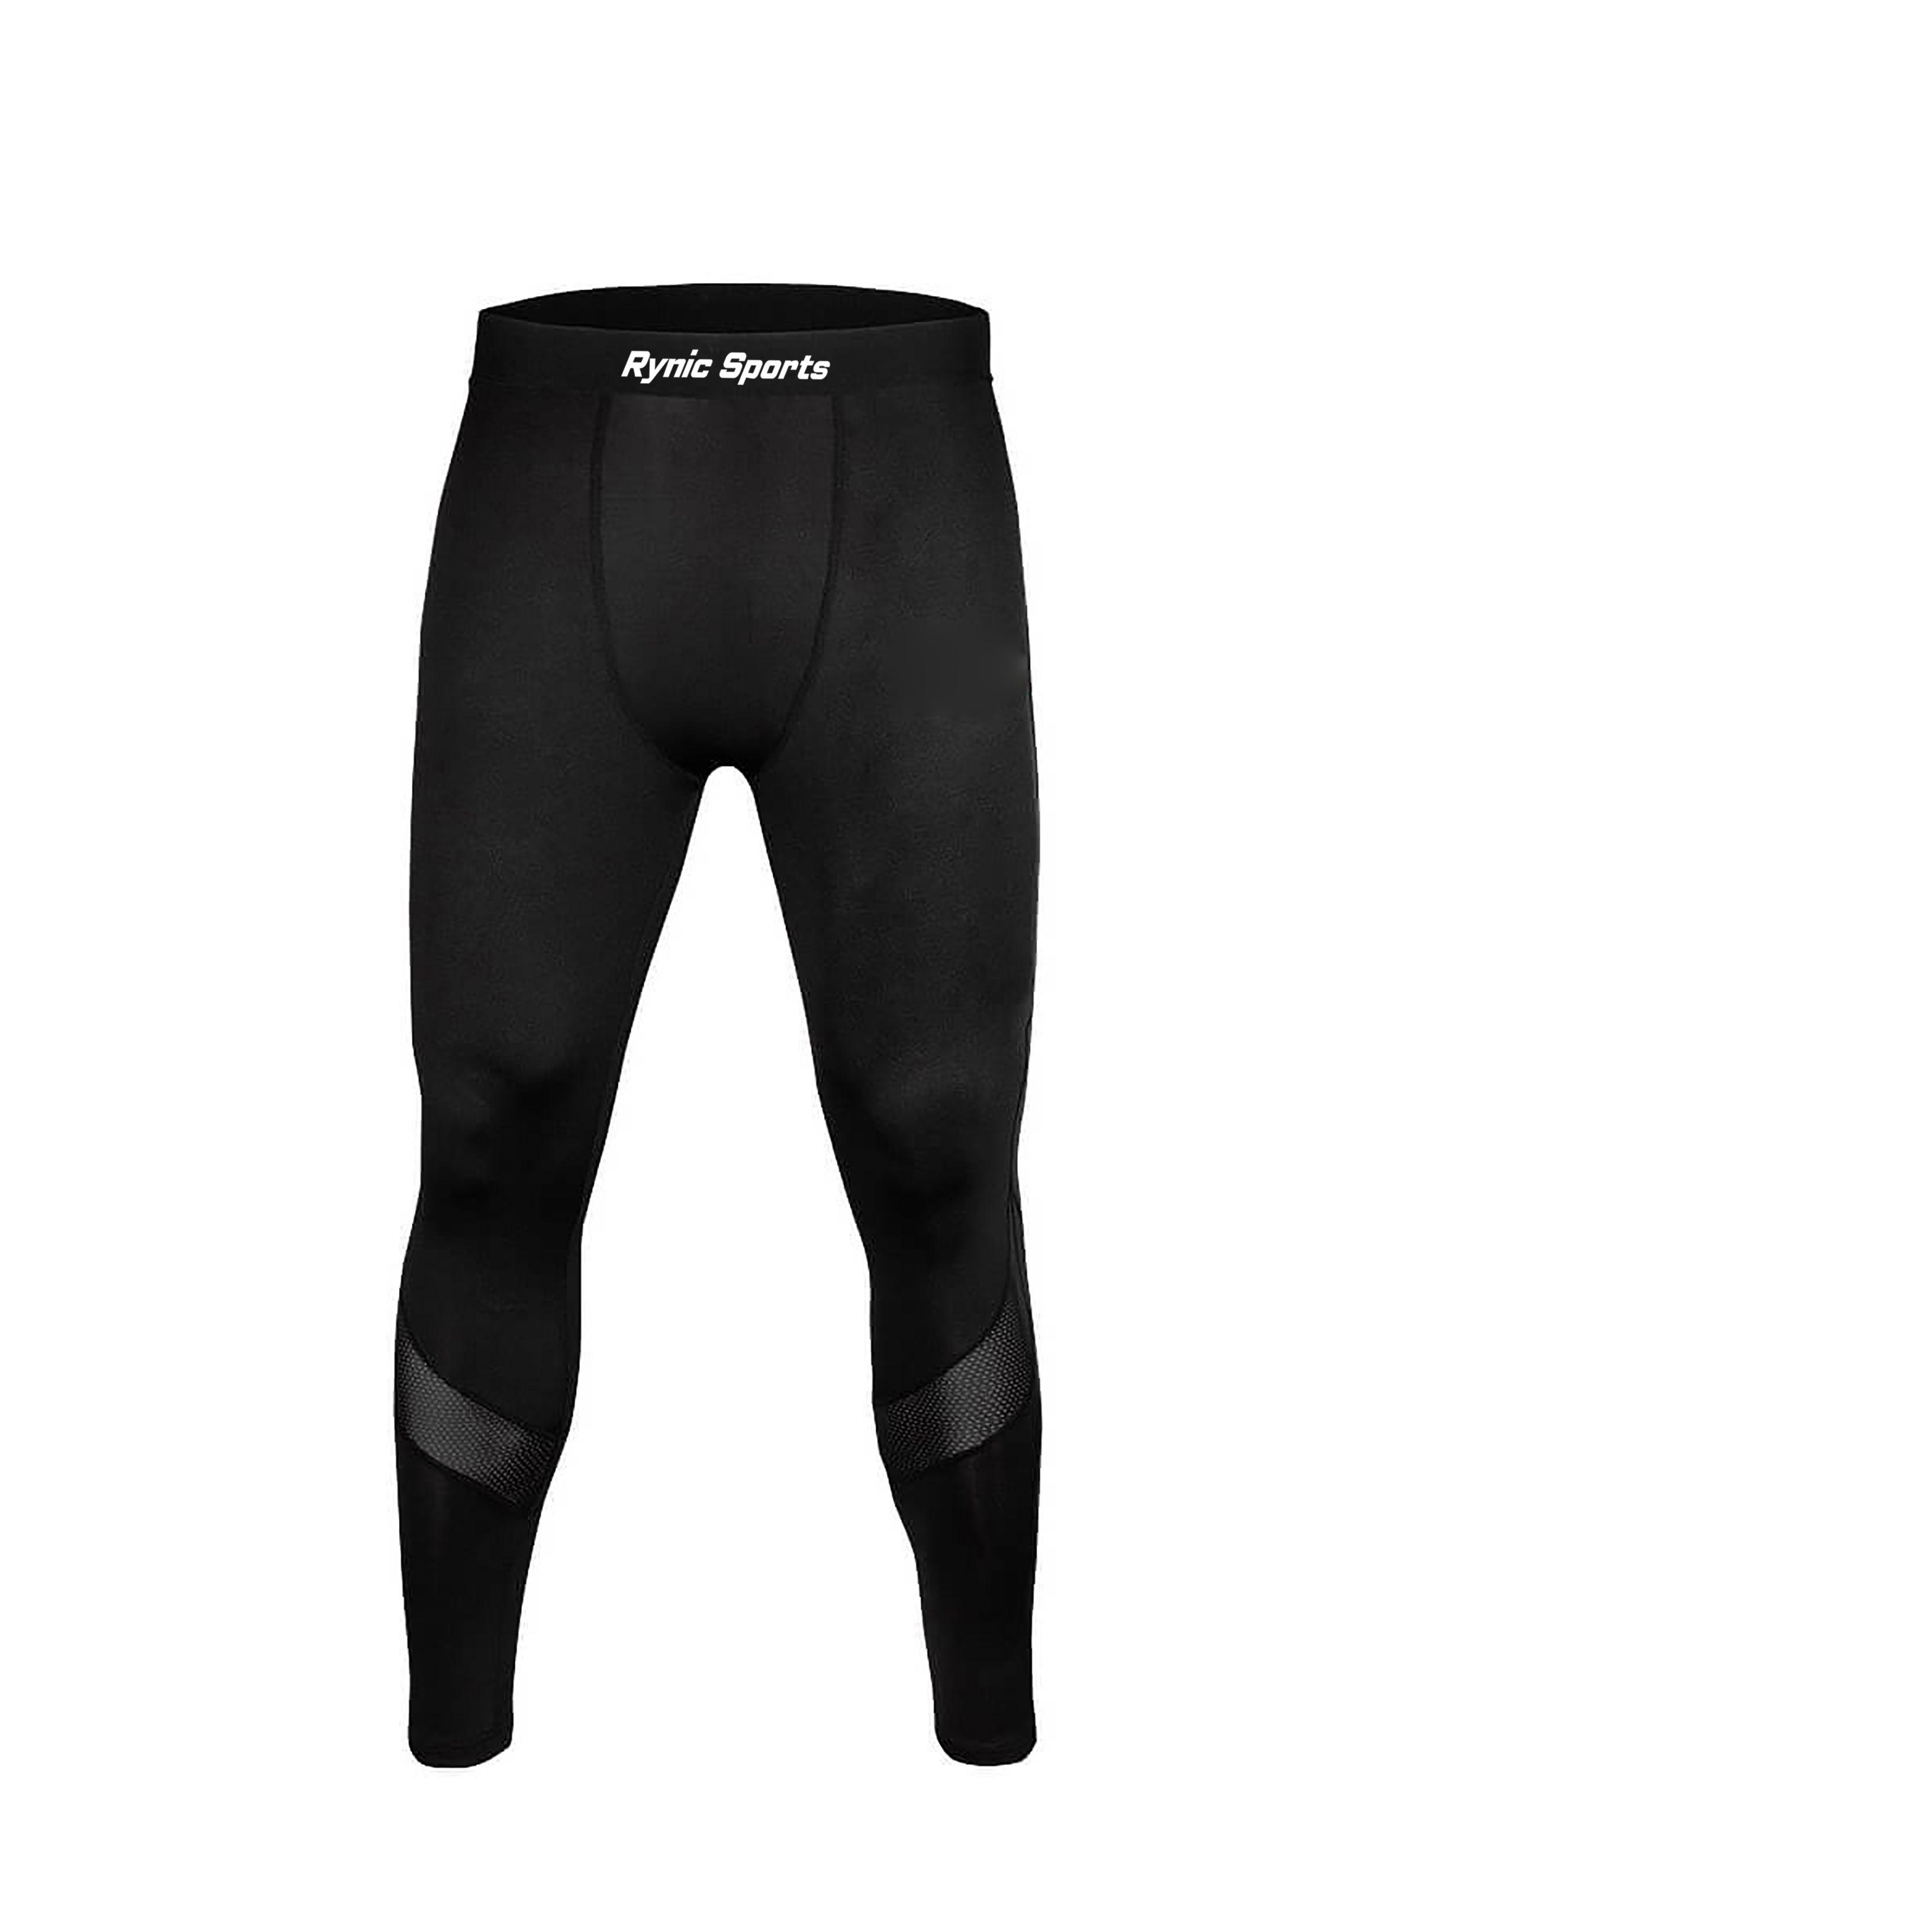 Compression Pants / Tights